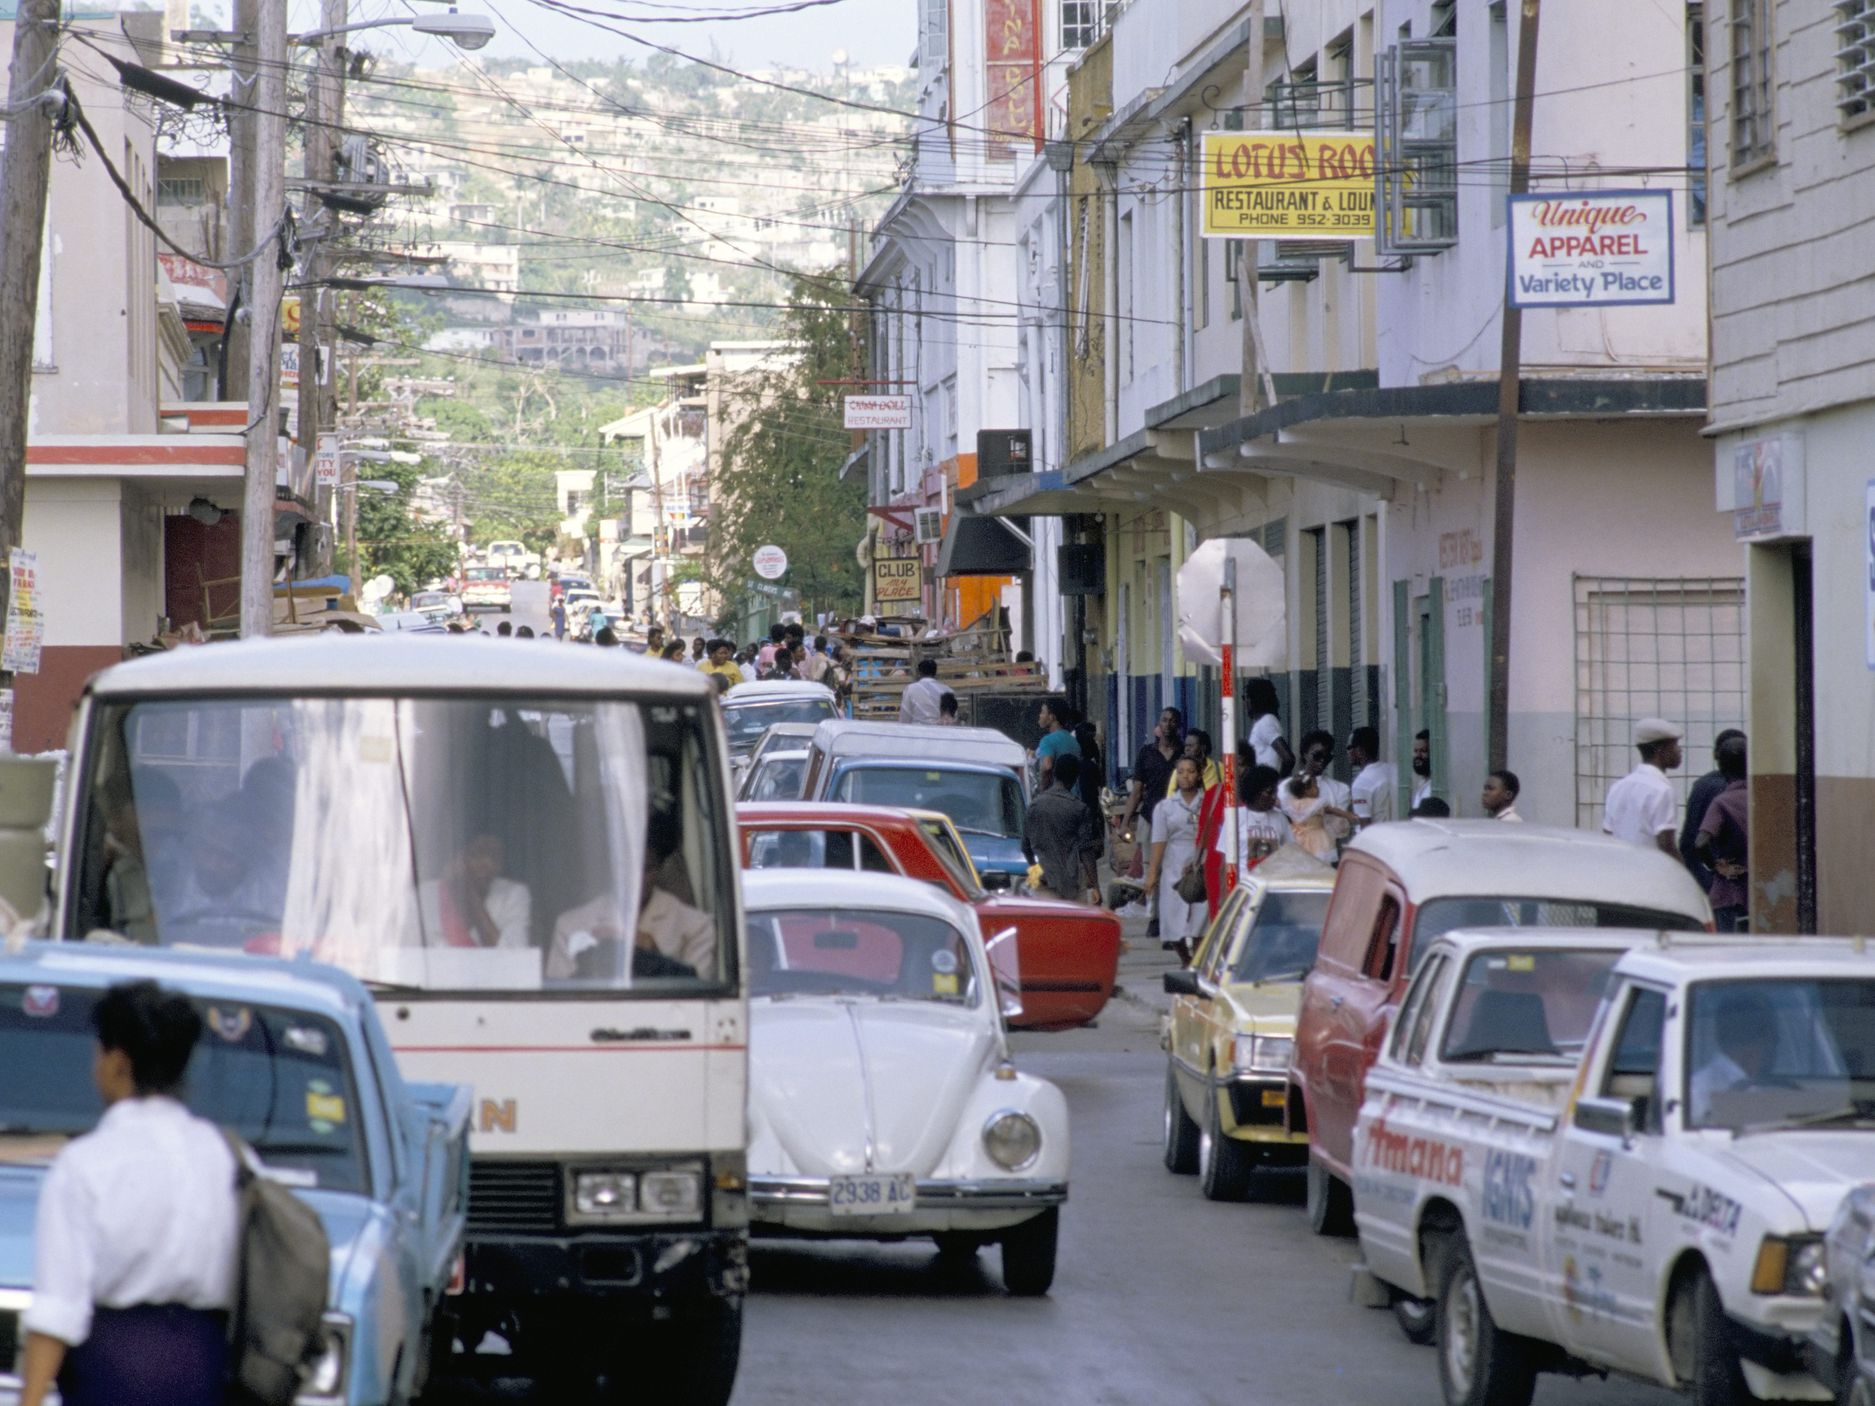 Getting Around Jamaica on Public Transport